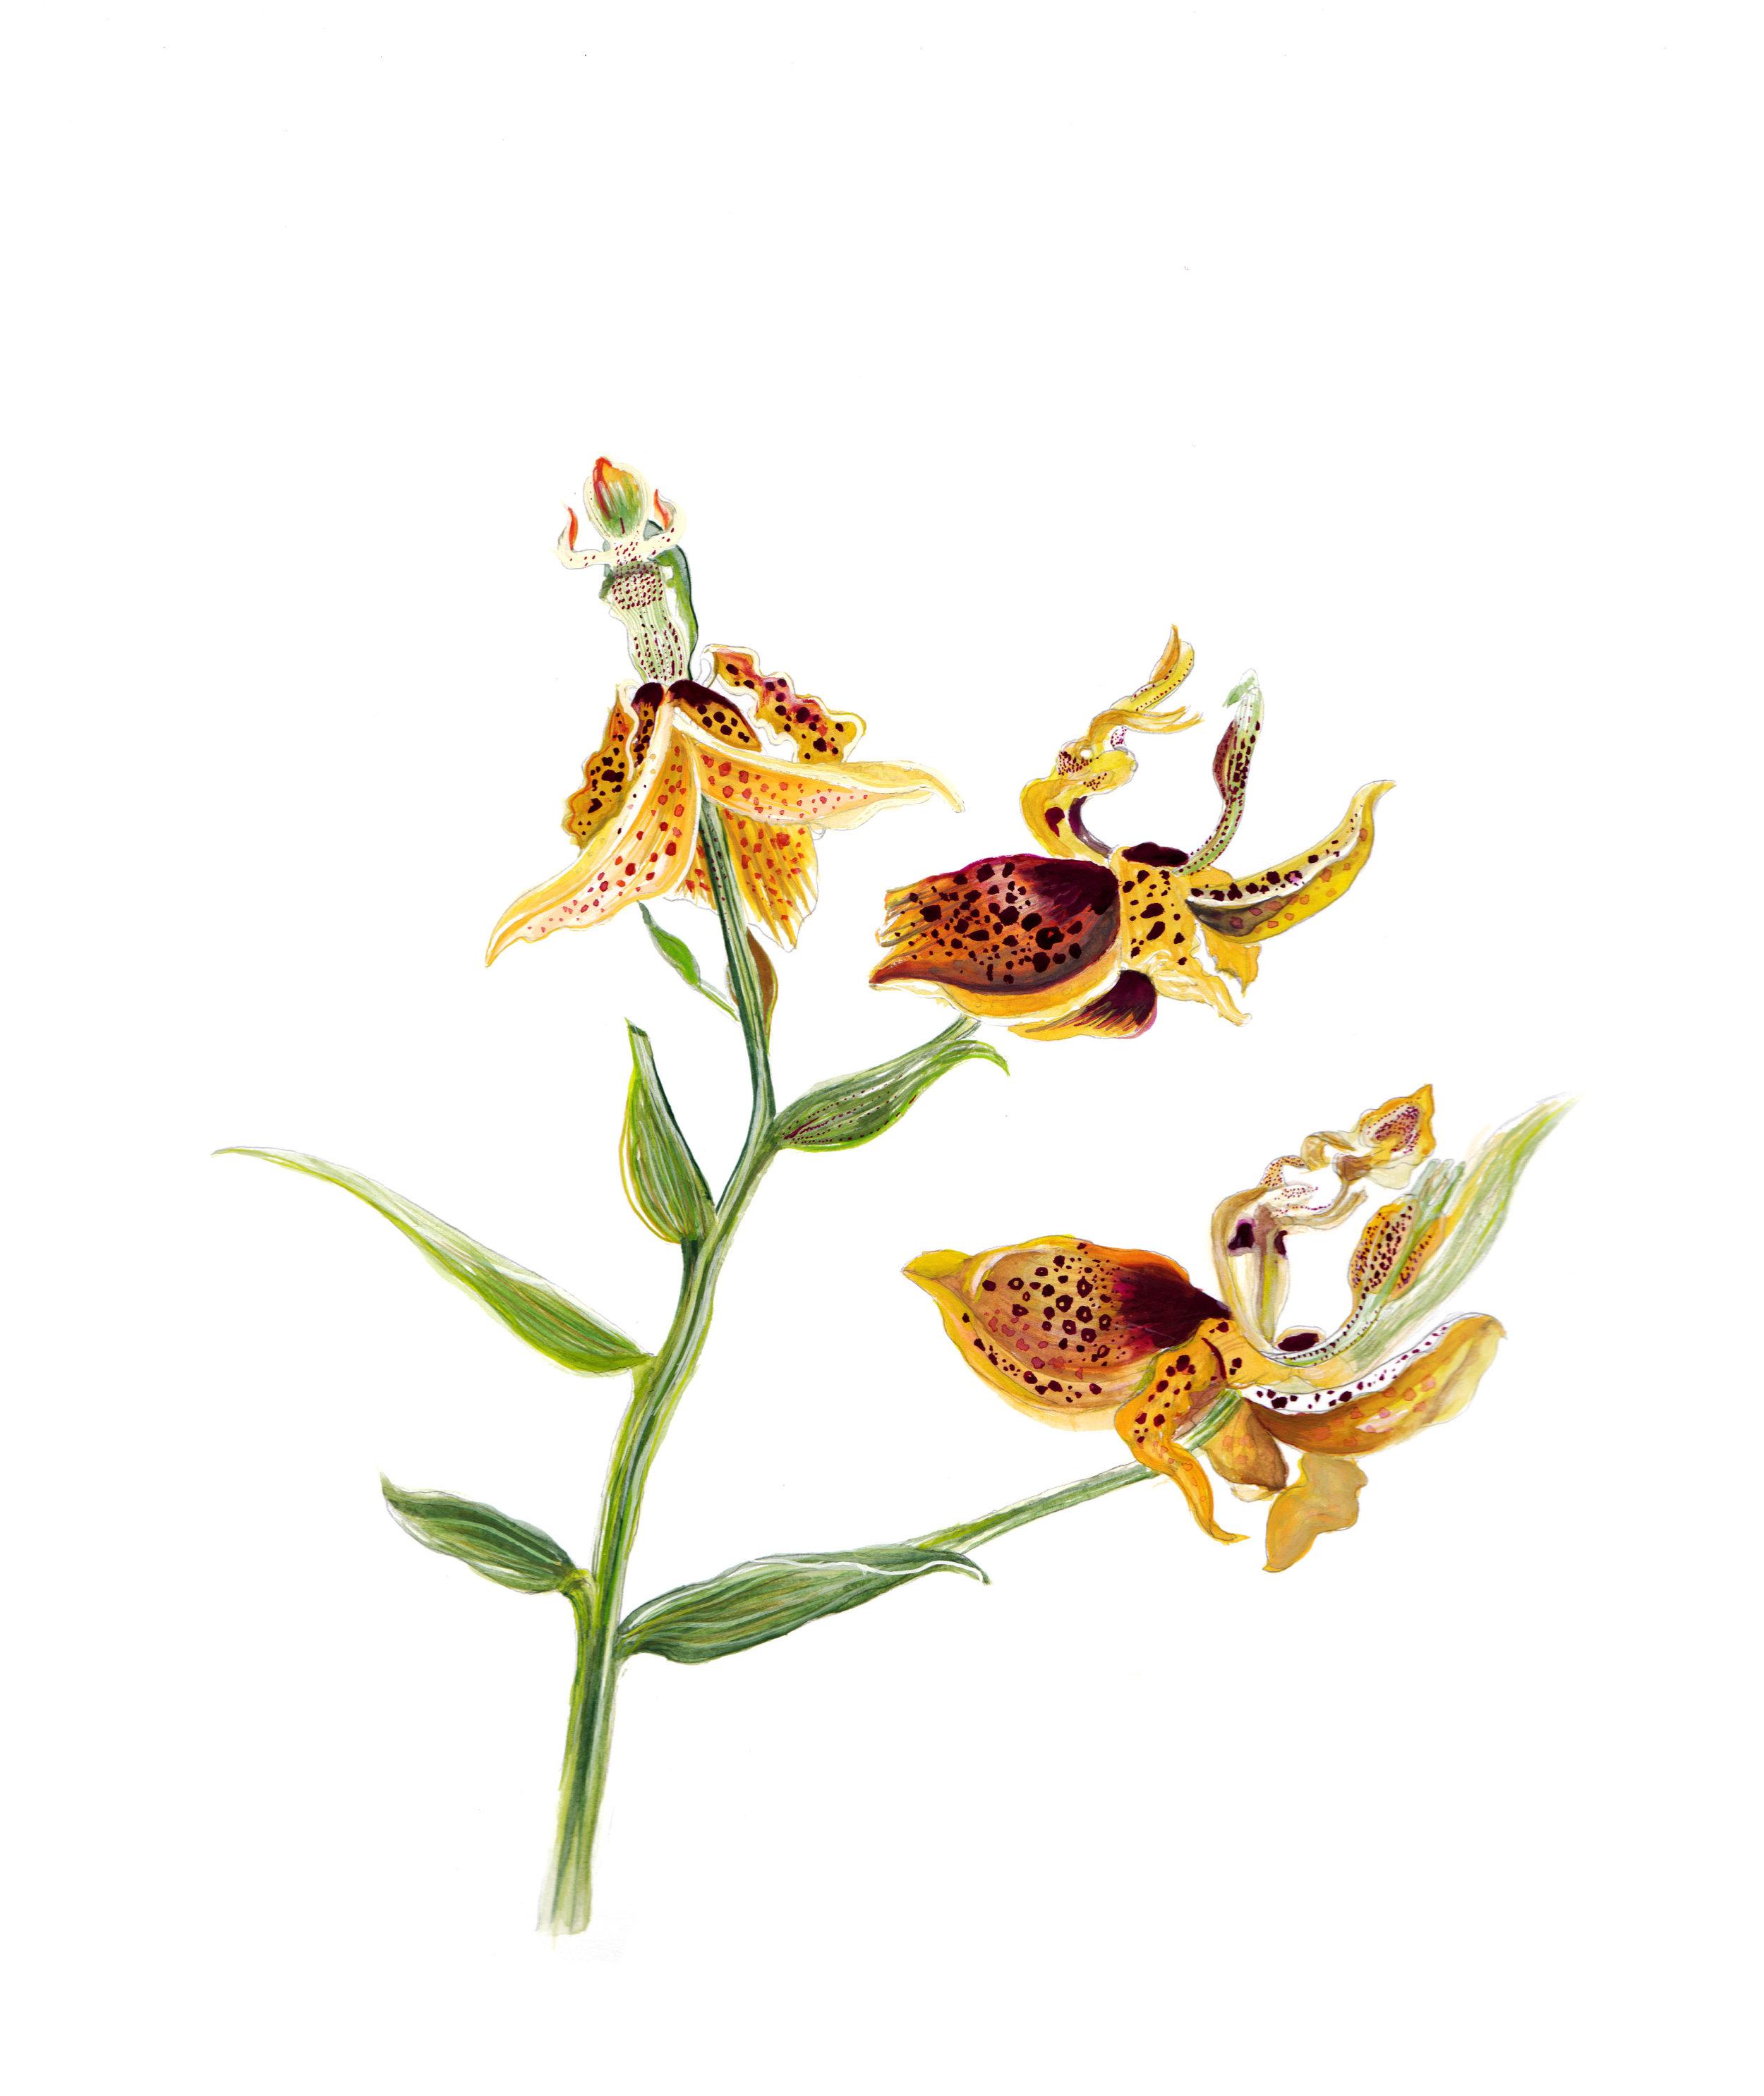 floral edited squarespace orcid.jpg